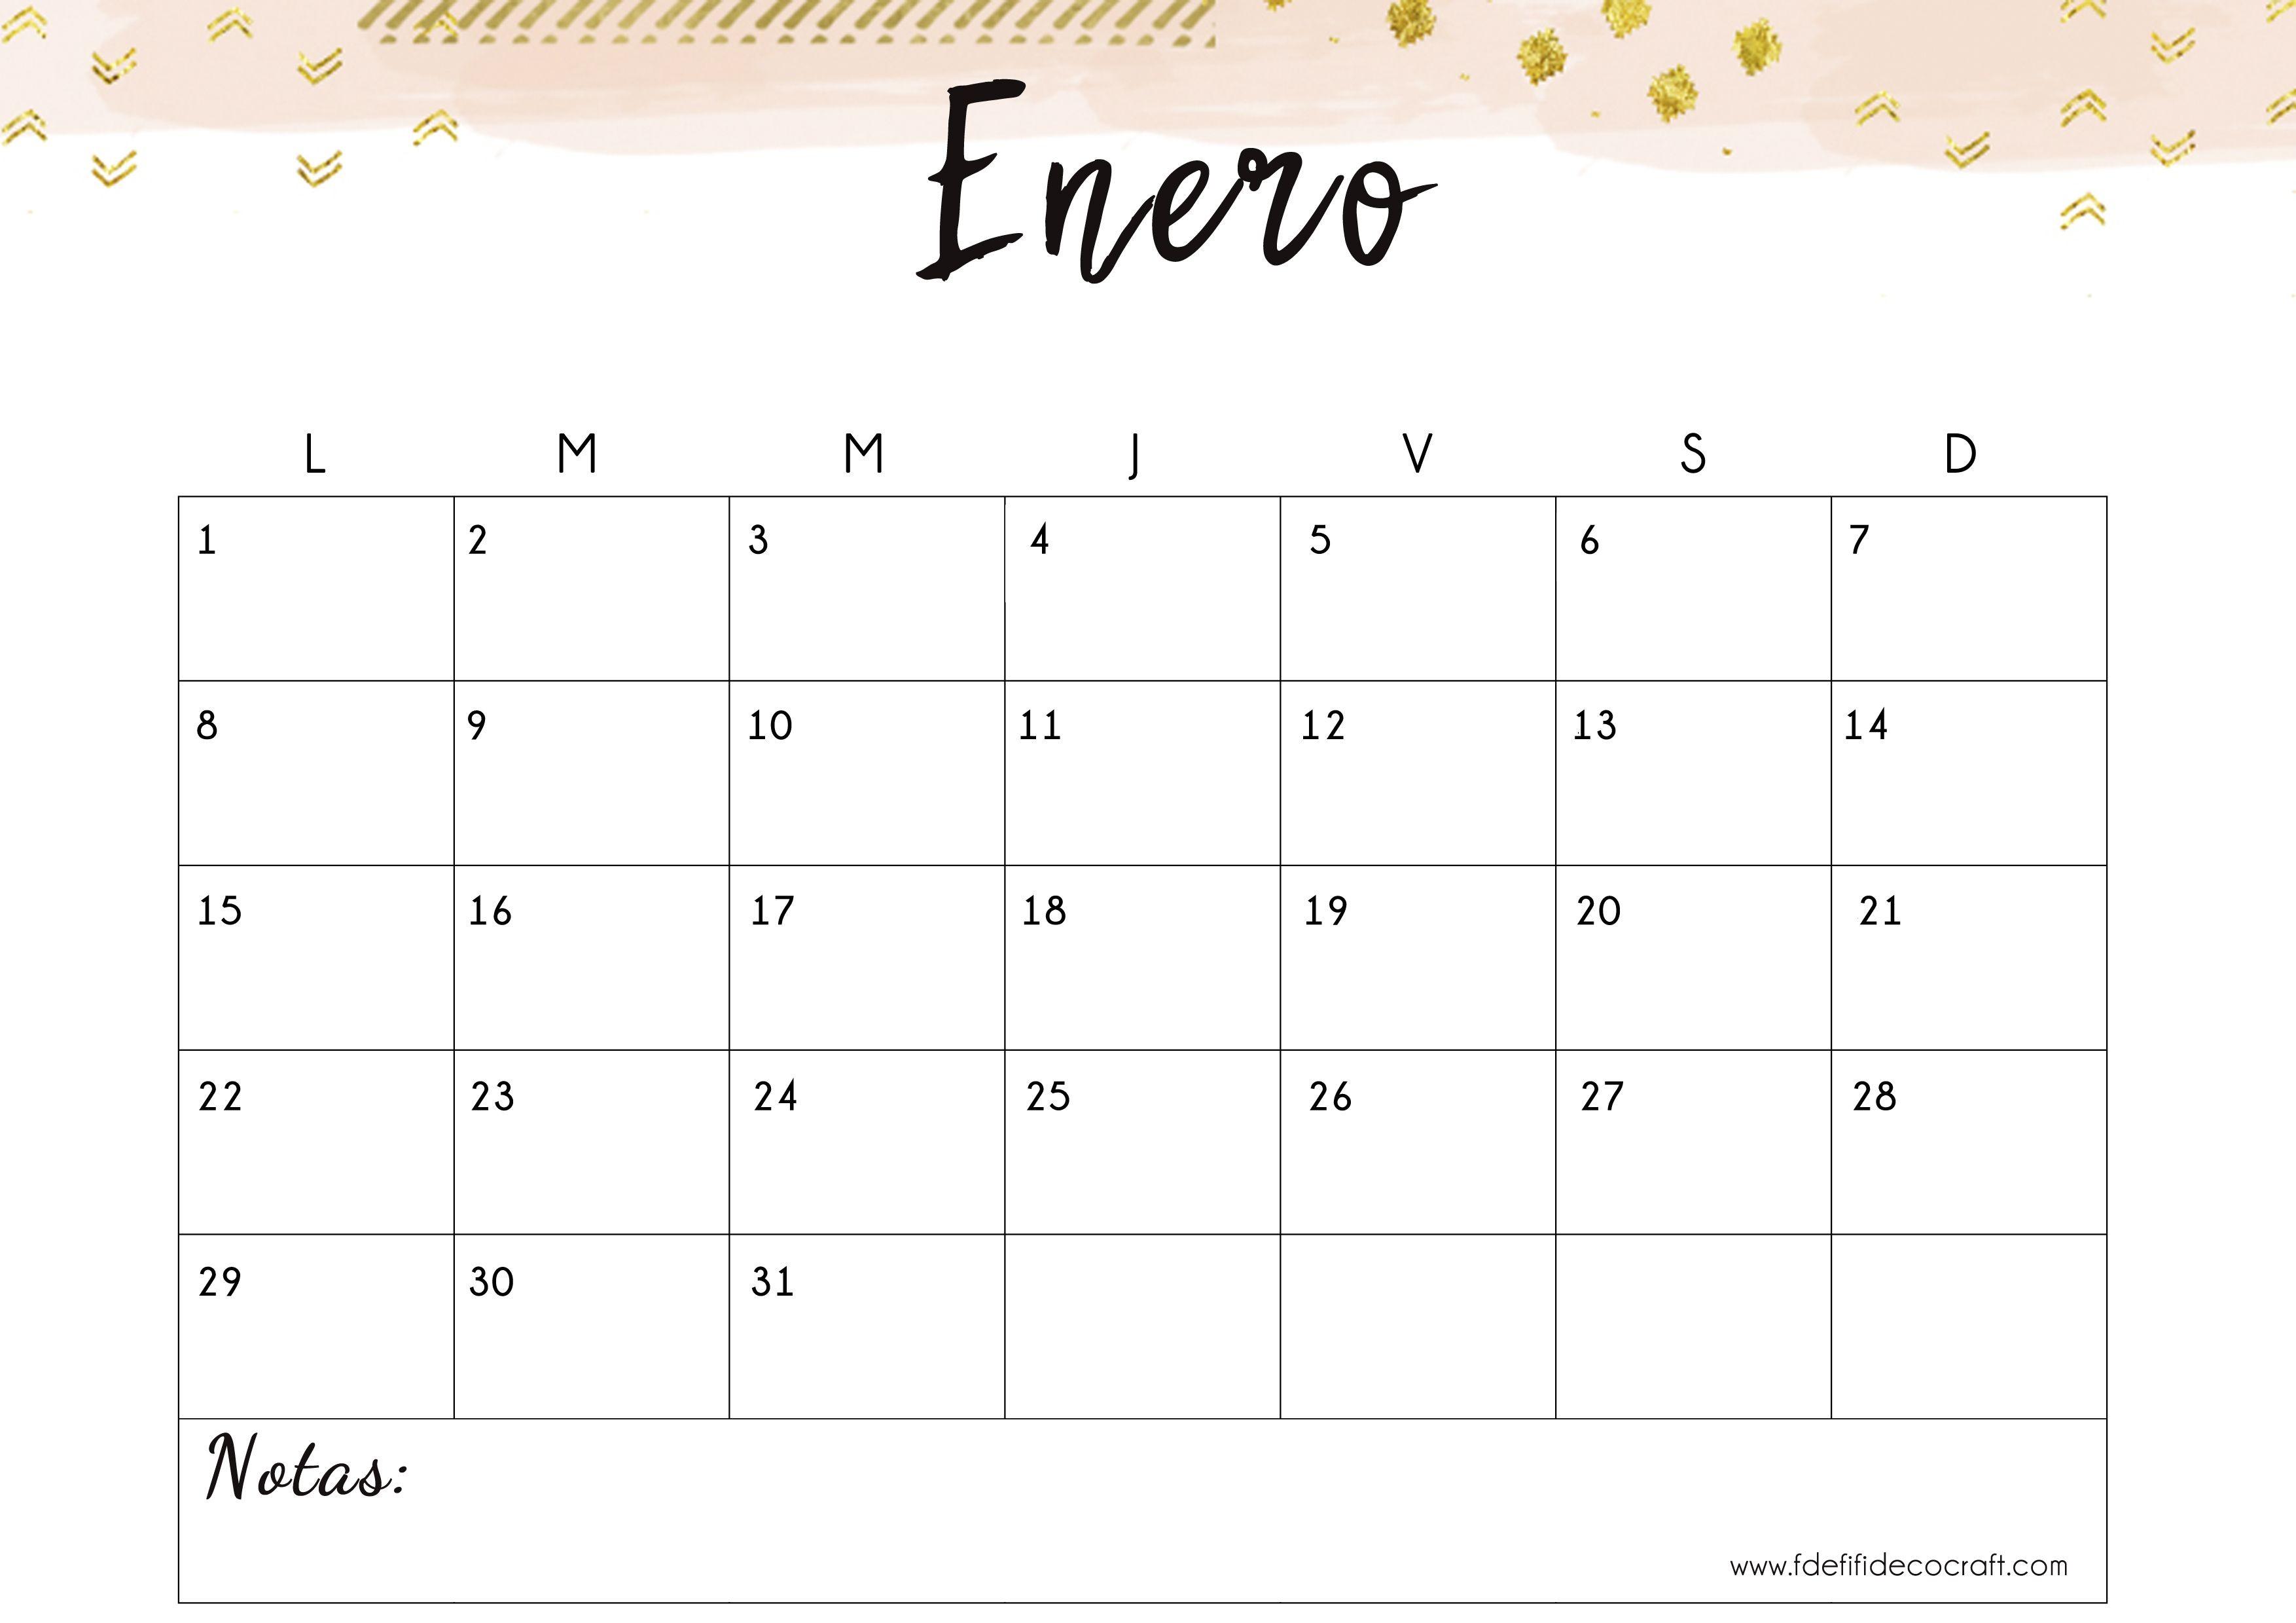 Calendario enero 2018 para imprimir imprimir gratis Imprimible Descargable